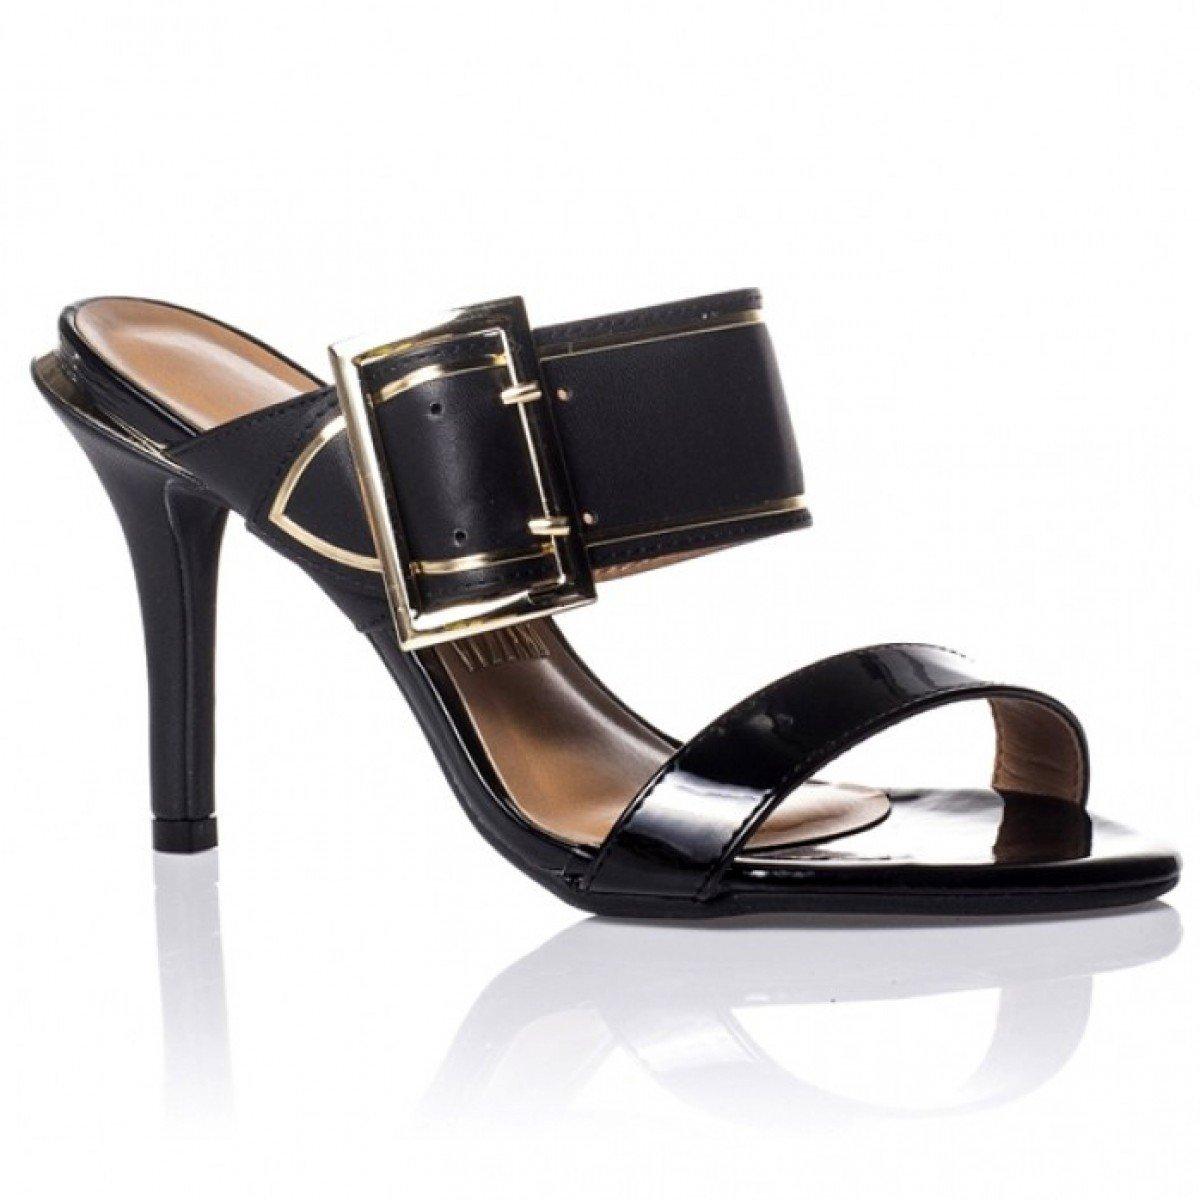 1dcd571ff7 Sandália Feminina Vizzano Verniz Premium Preto - Compre Agora ...